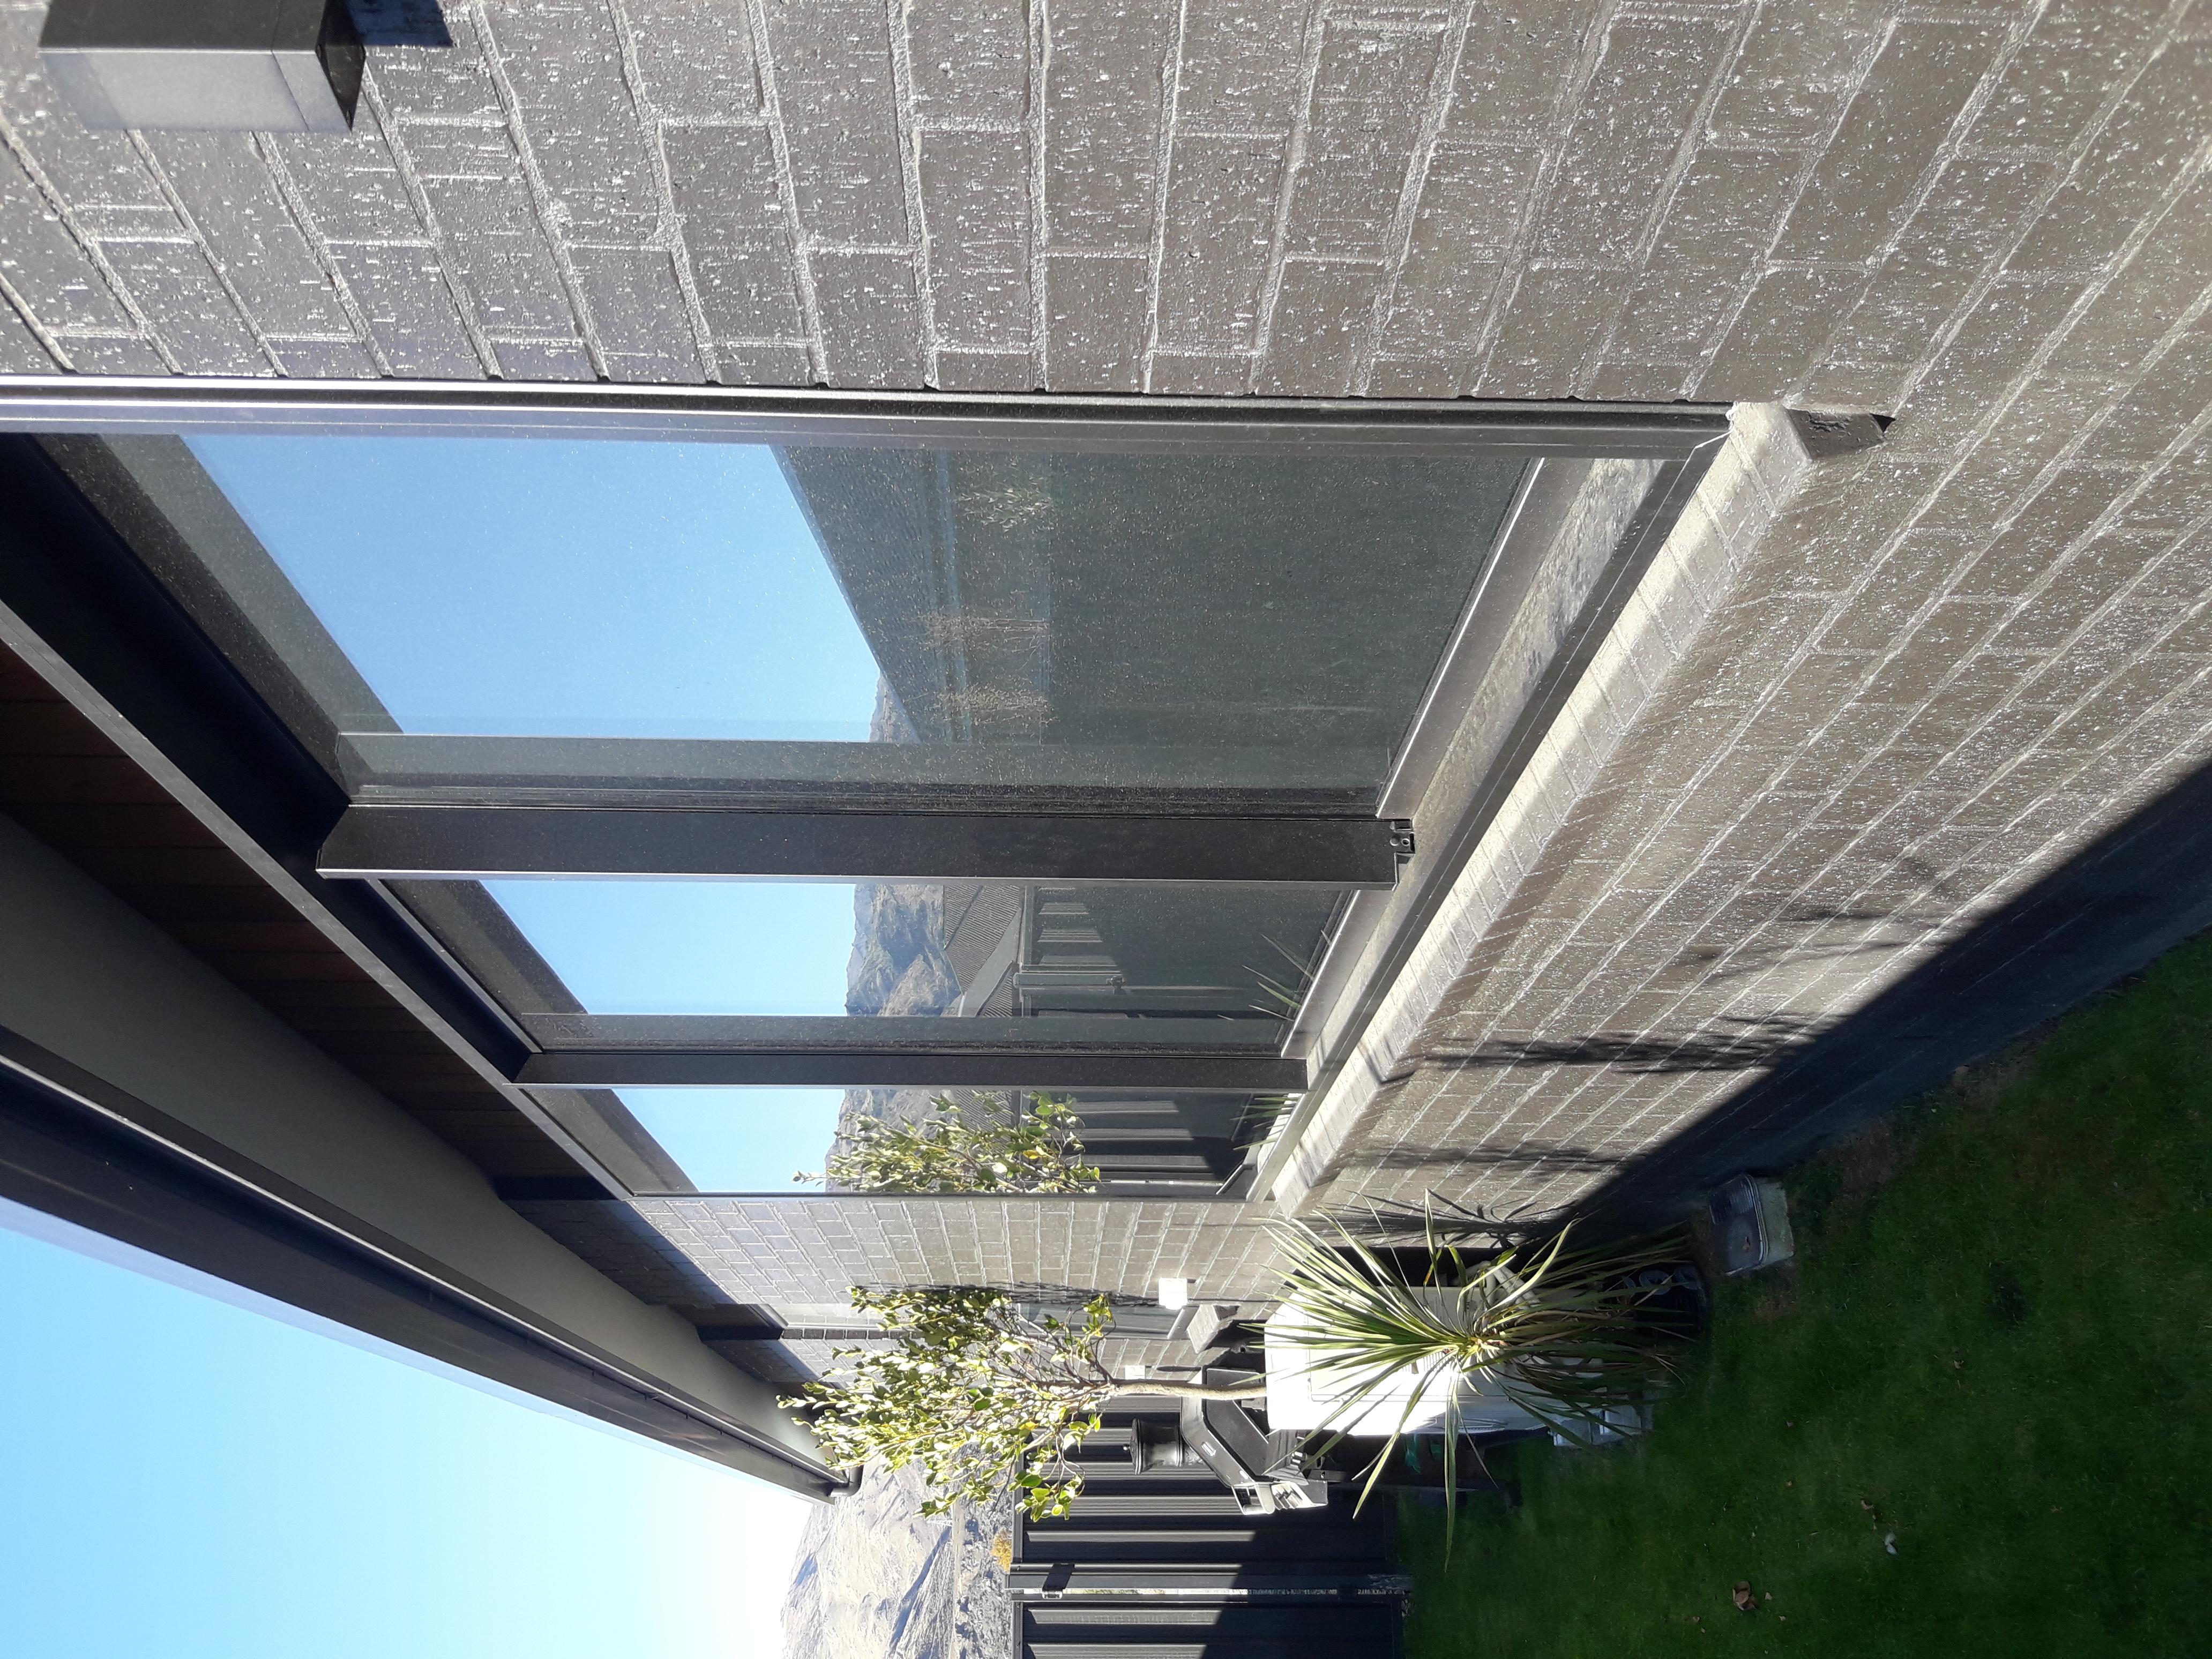 New House - Brickwork